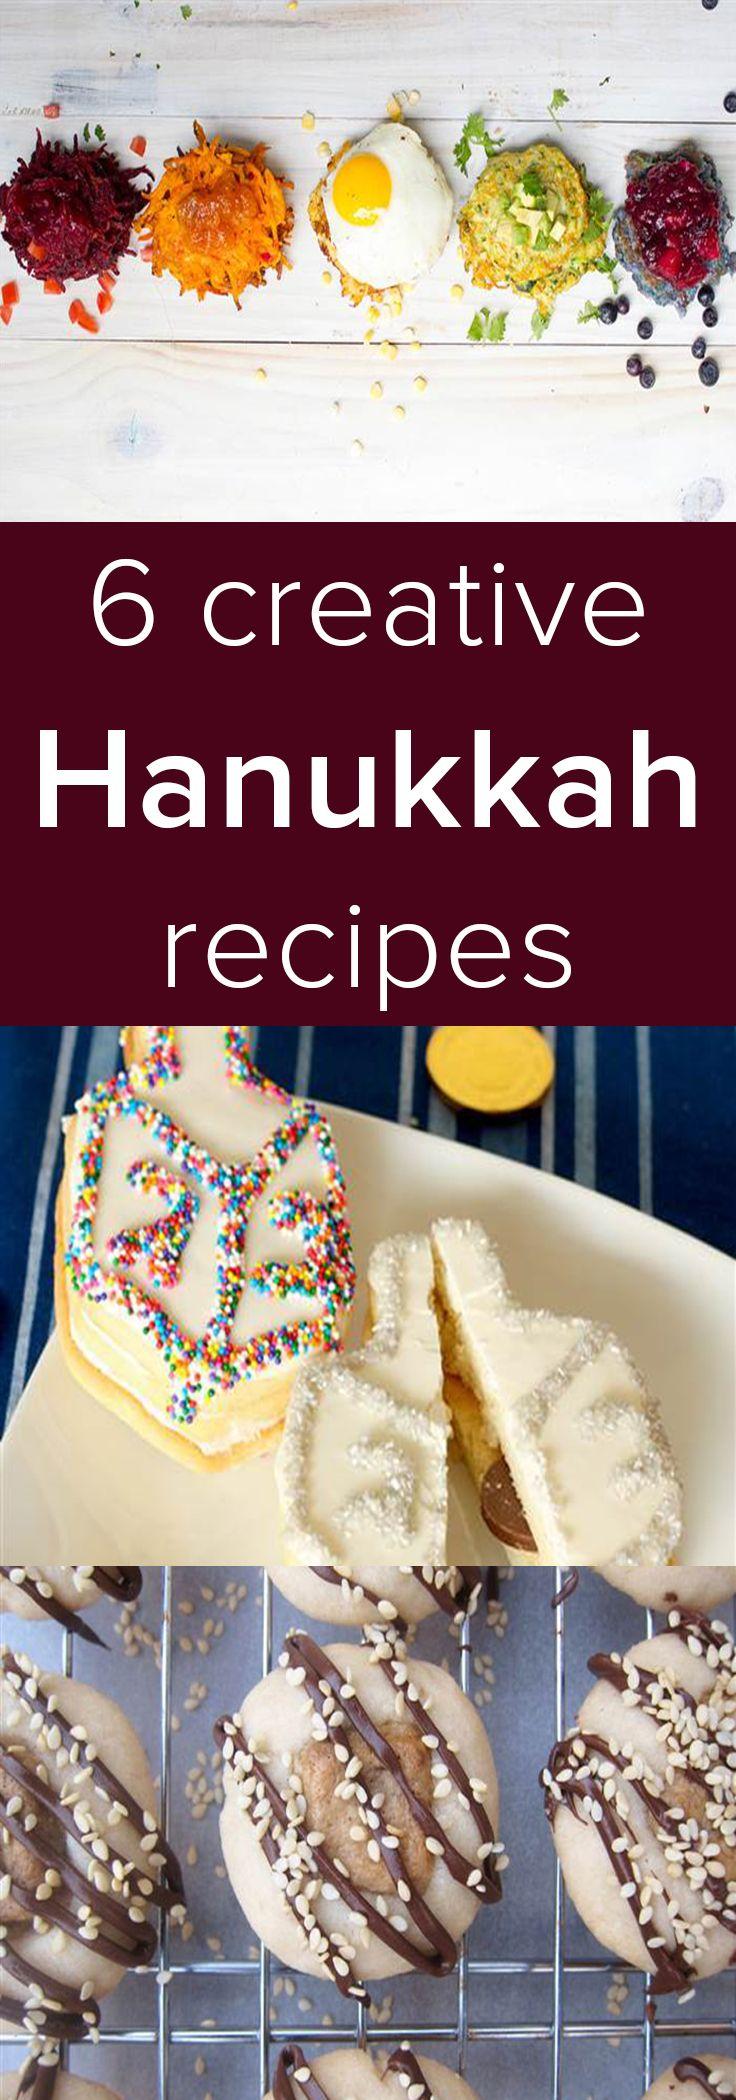 We are loving these easy recipes, perfect for Hanukkah including rainbow latkes and jelly doughnut holes.